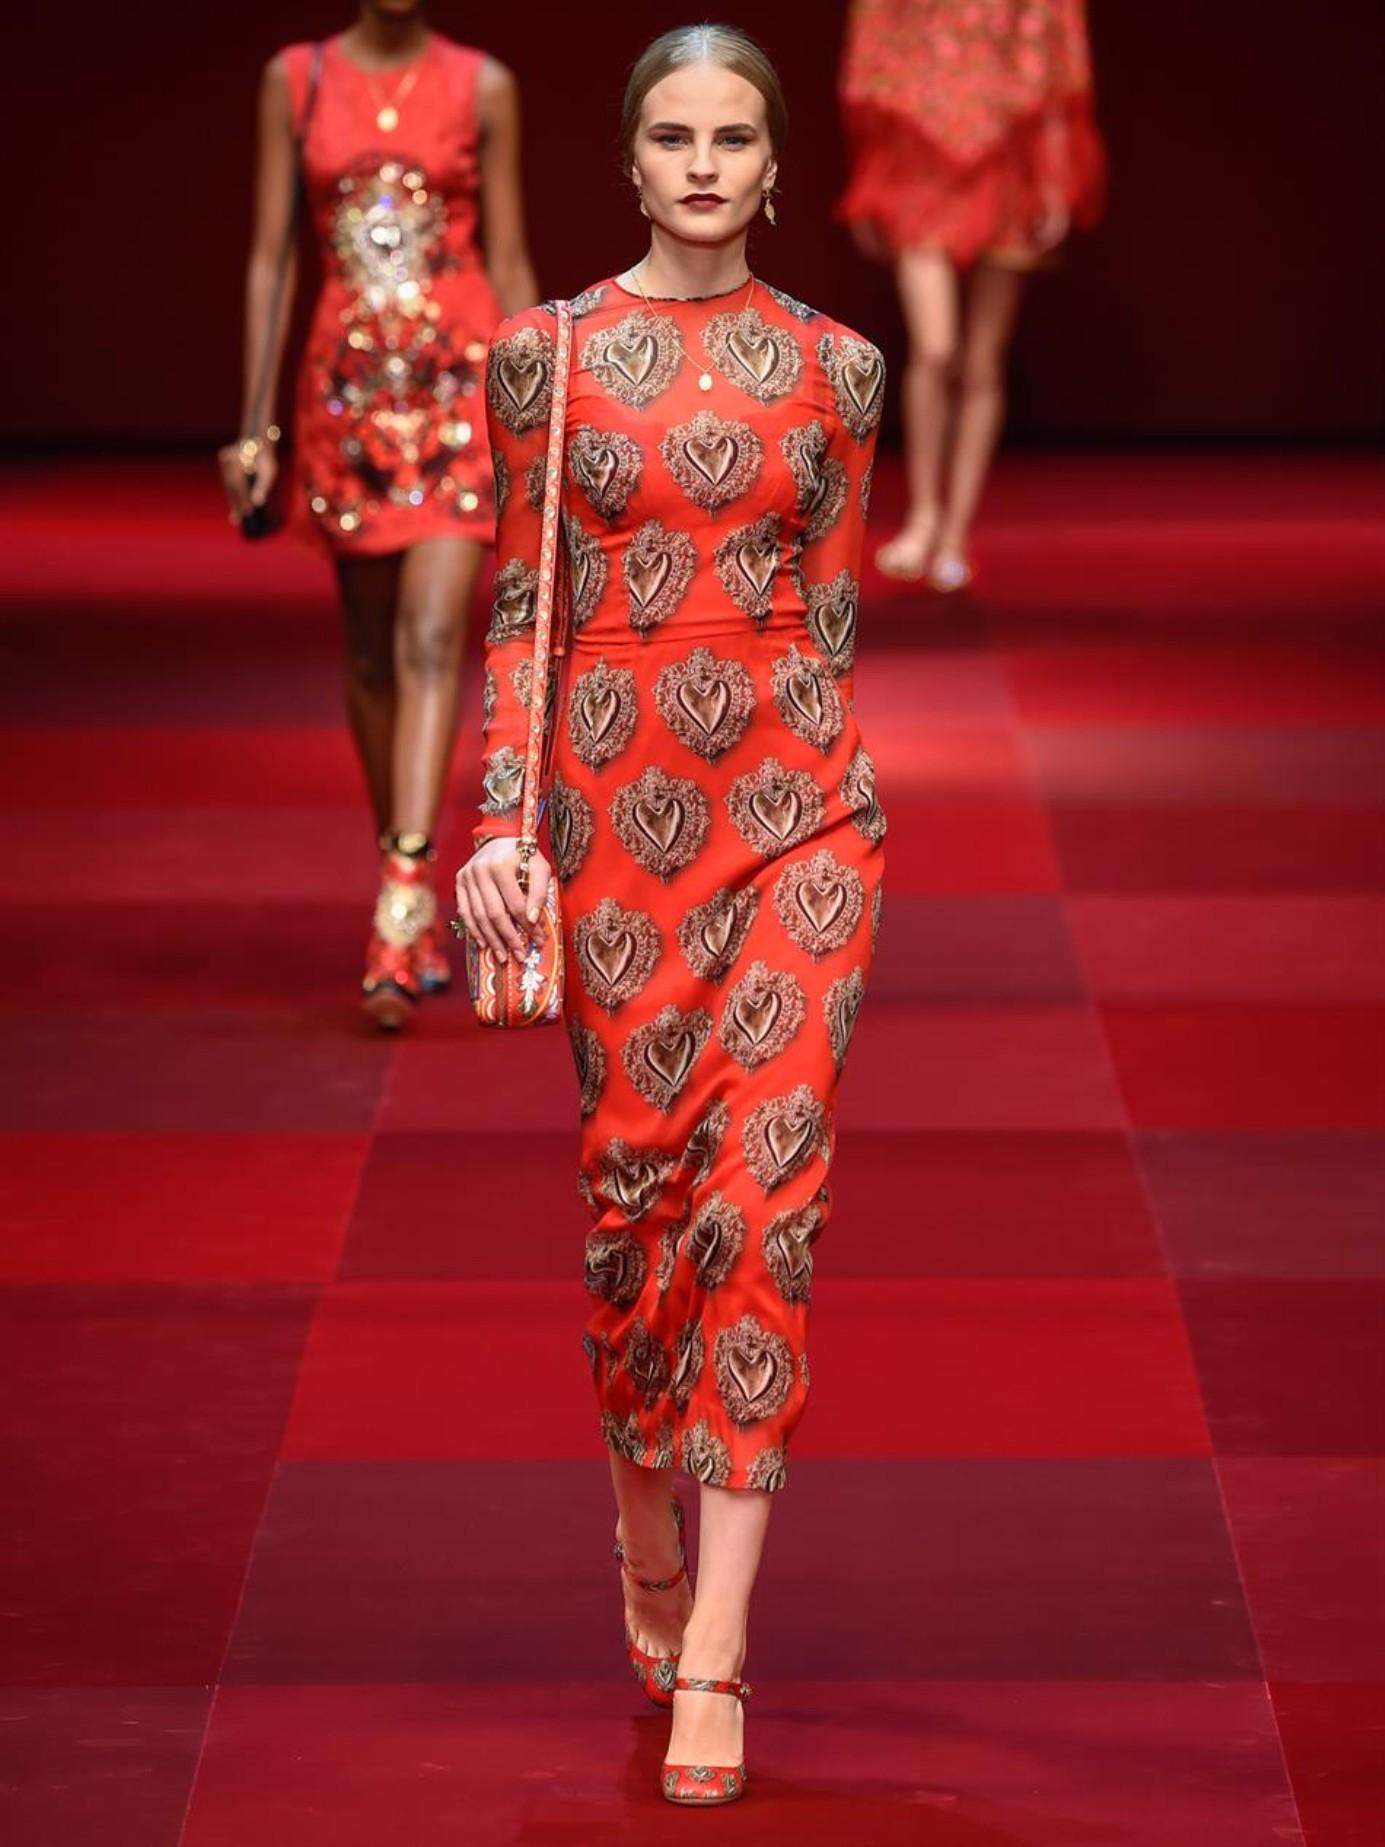 d0d1e0b9fe Dolce   gabbana Sacred Heart Stretch-Chiffon Dress in Red